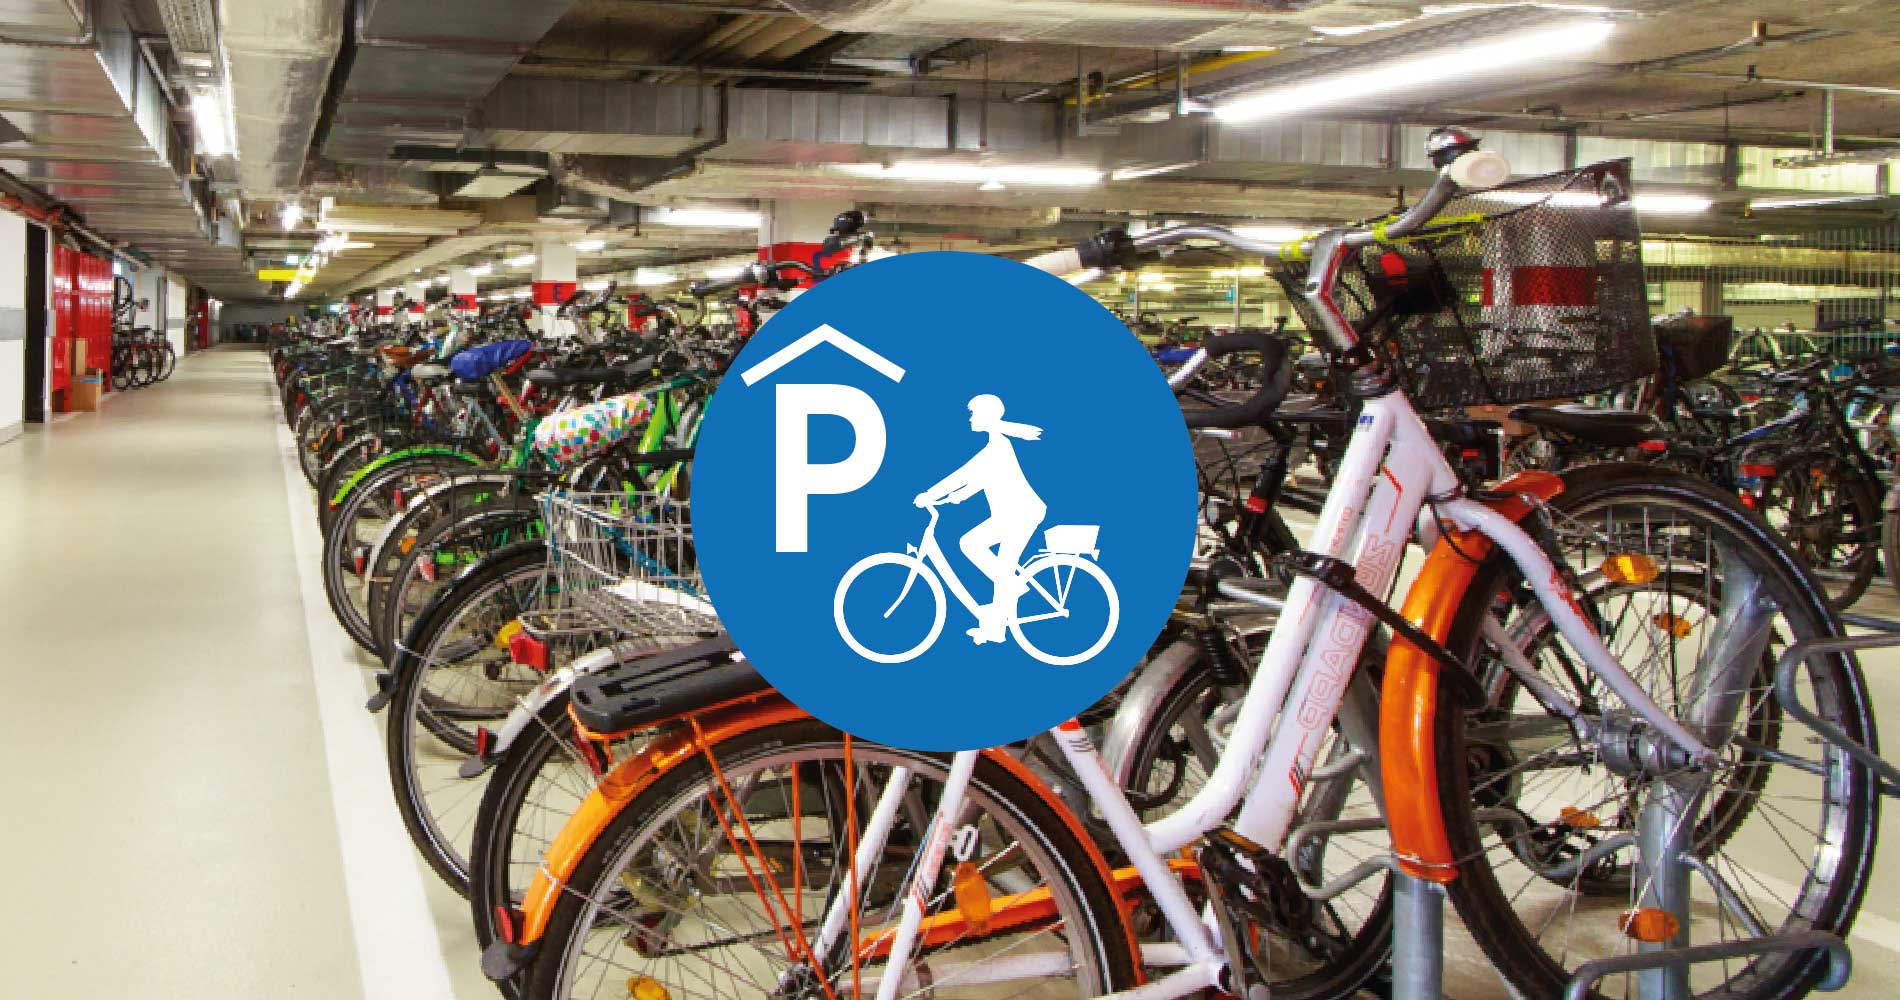 Fahrrad Parkhaus Radstation Potsdam Hauptbahnhof